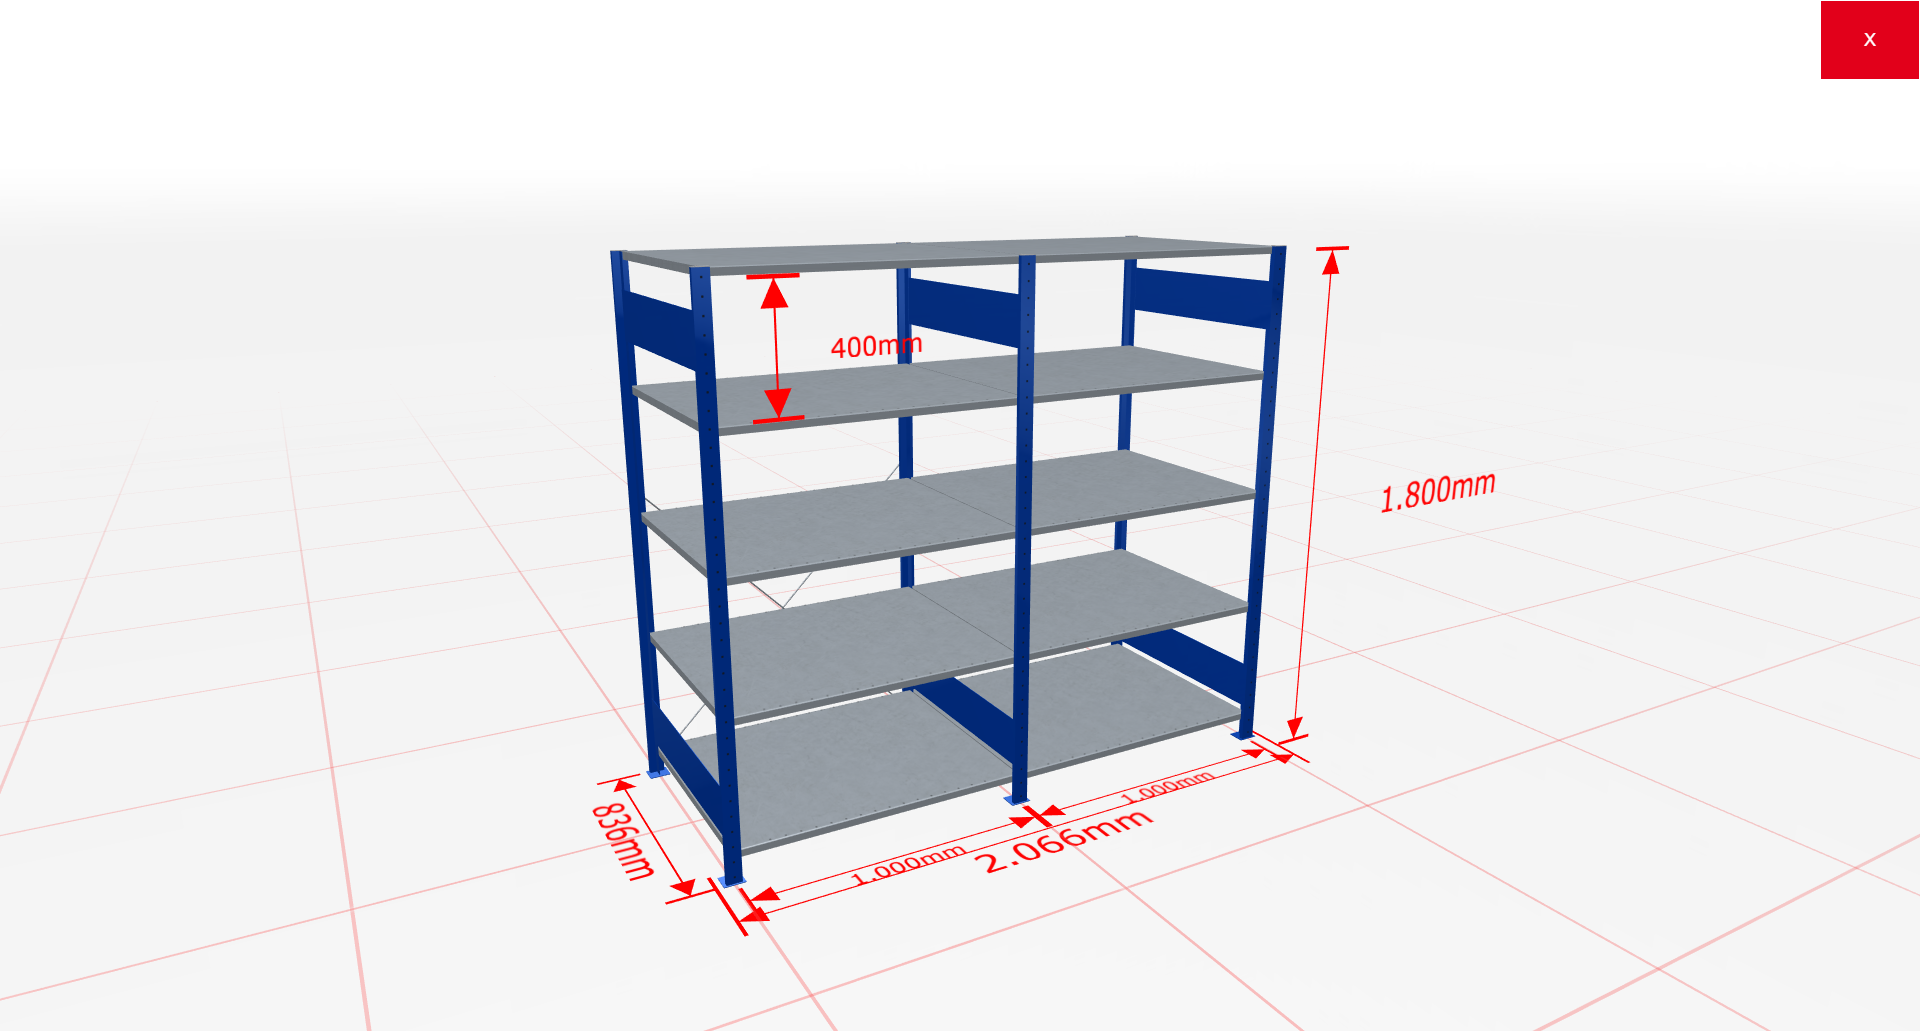 Fachbodenregal Komplettregal 1800x2066x800 mm (HxBxT) SCHULTE Lagertechnik blau 5 Ebenen  150 kg je Boden